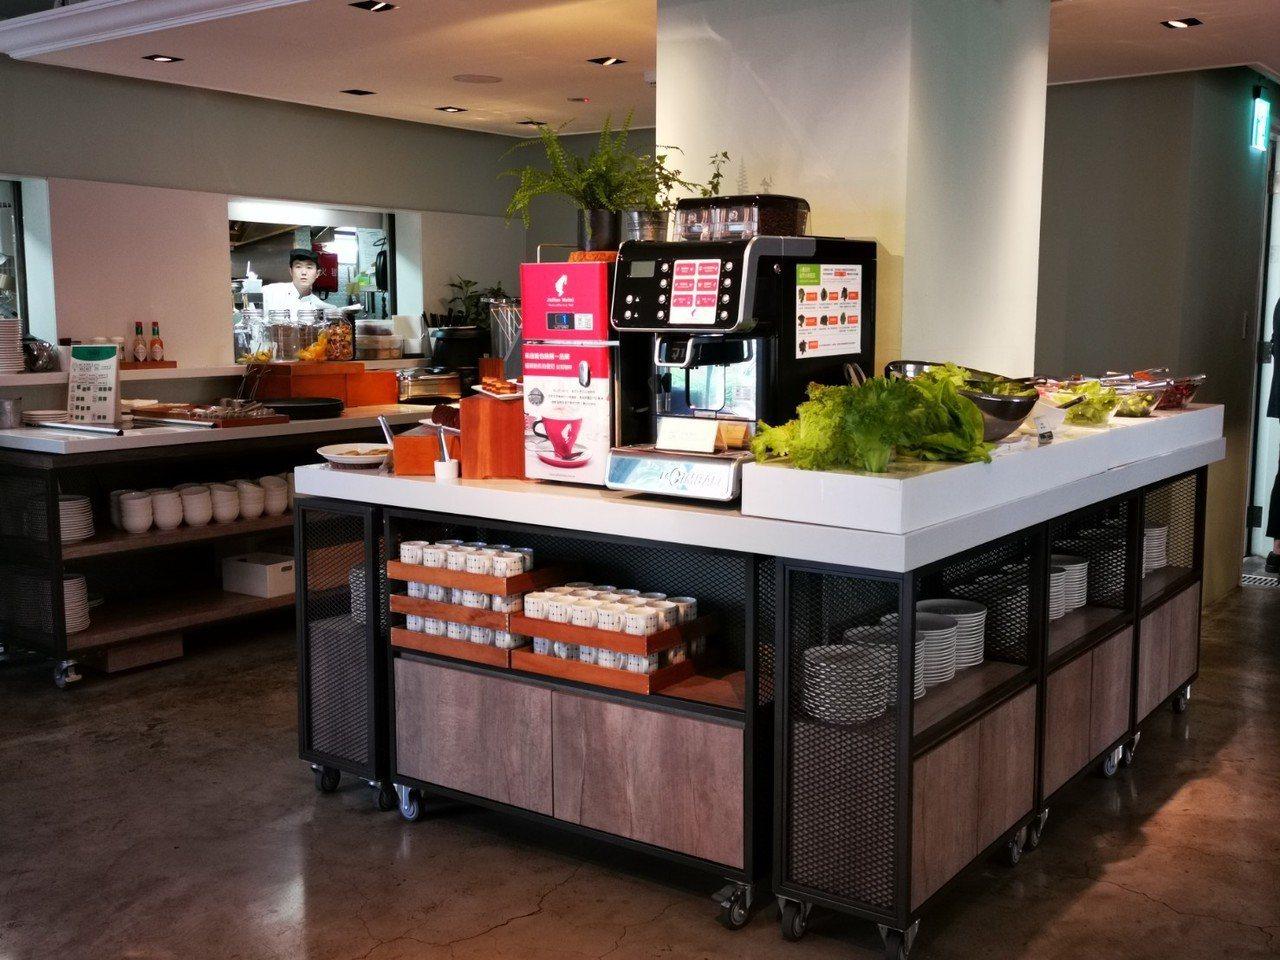 Port23的自助餐檯,提供有機生菜沙拉、甜點、湯品、輕食等多項菜色,讓客人除了...